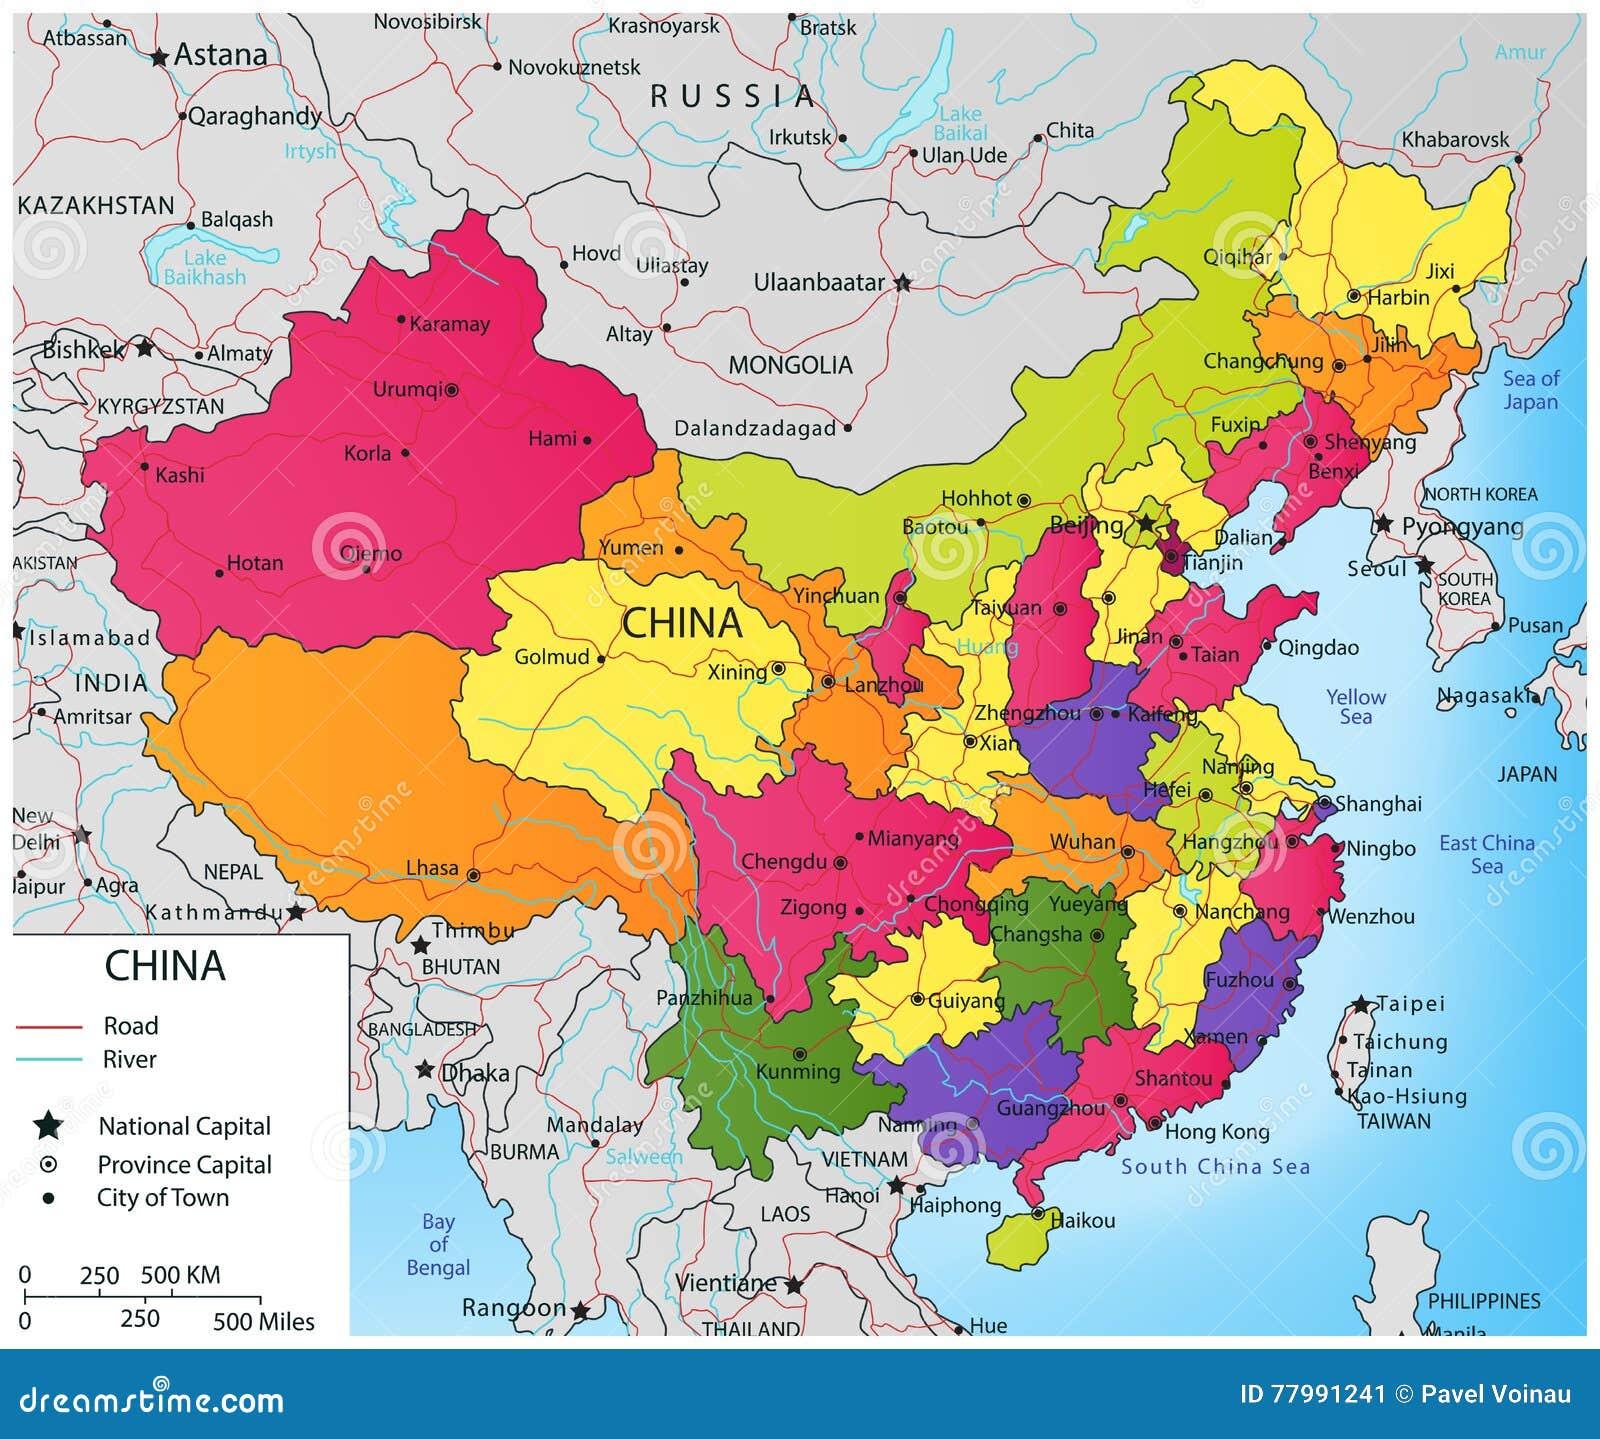 Cartina Geografica Della Cina.La Cina Lessons Blendspace